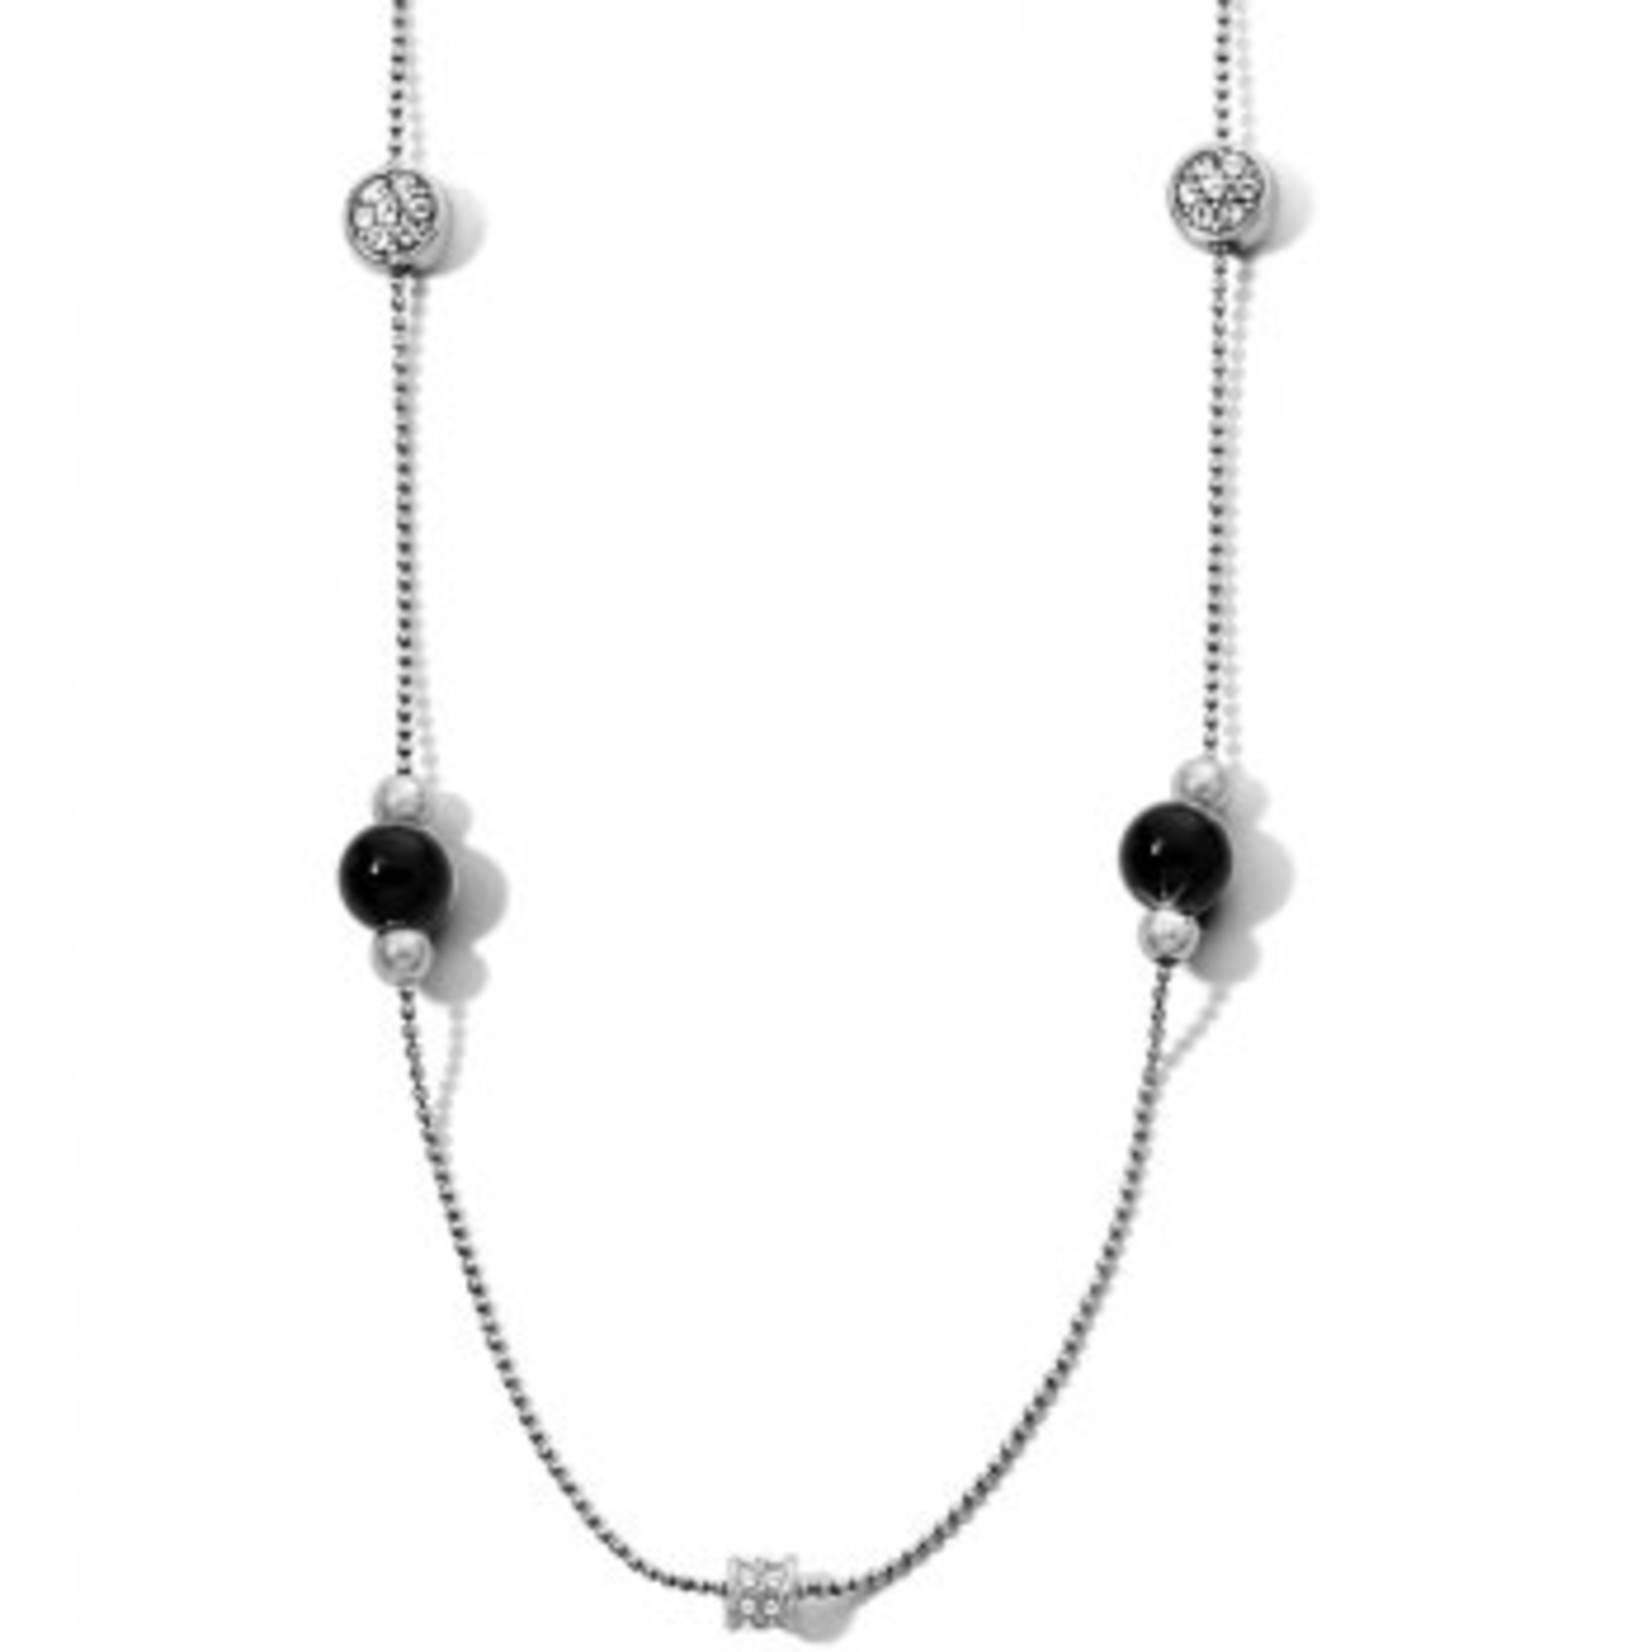 Brighton Meridian Prime Long Necklace Silver-Black